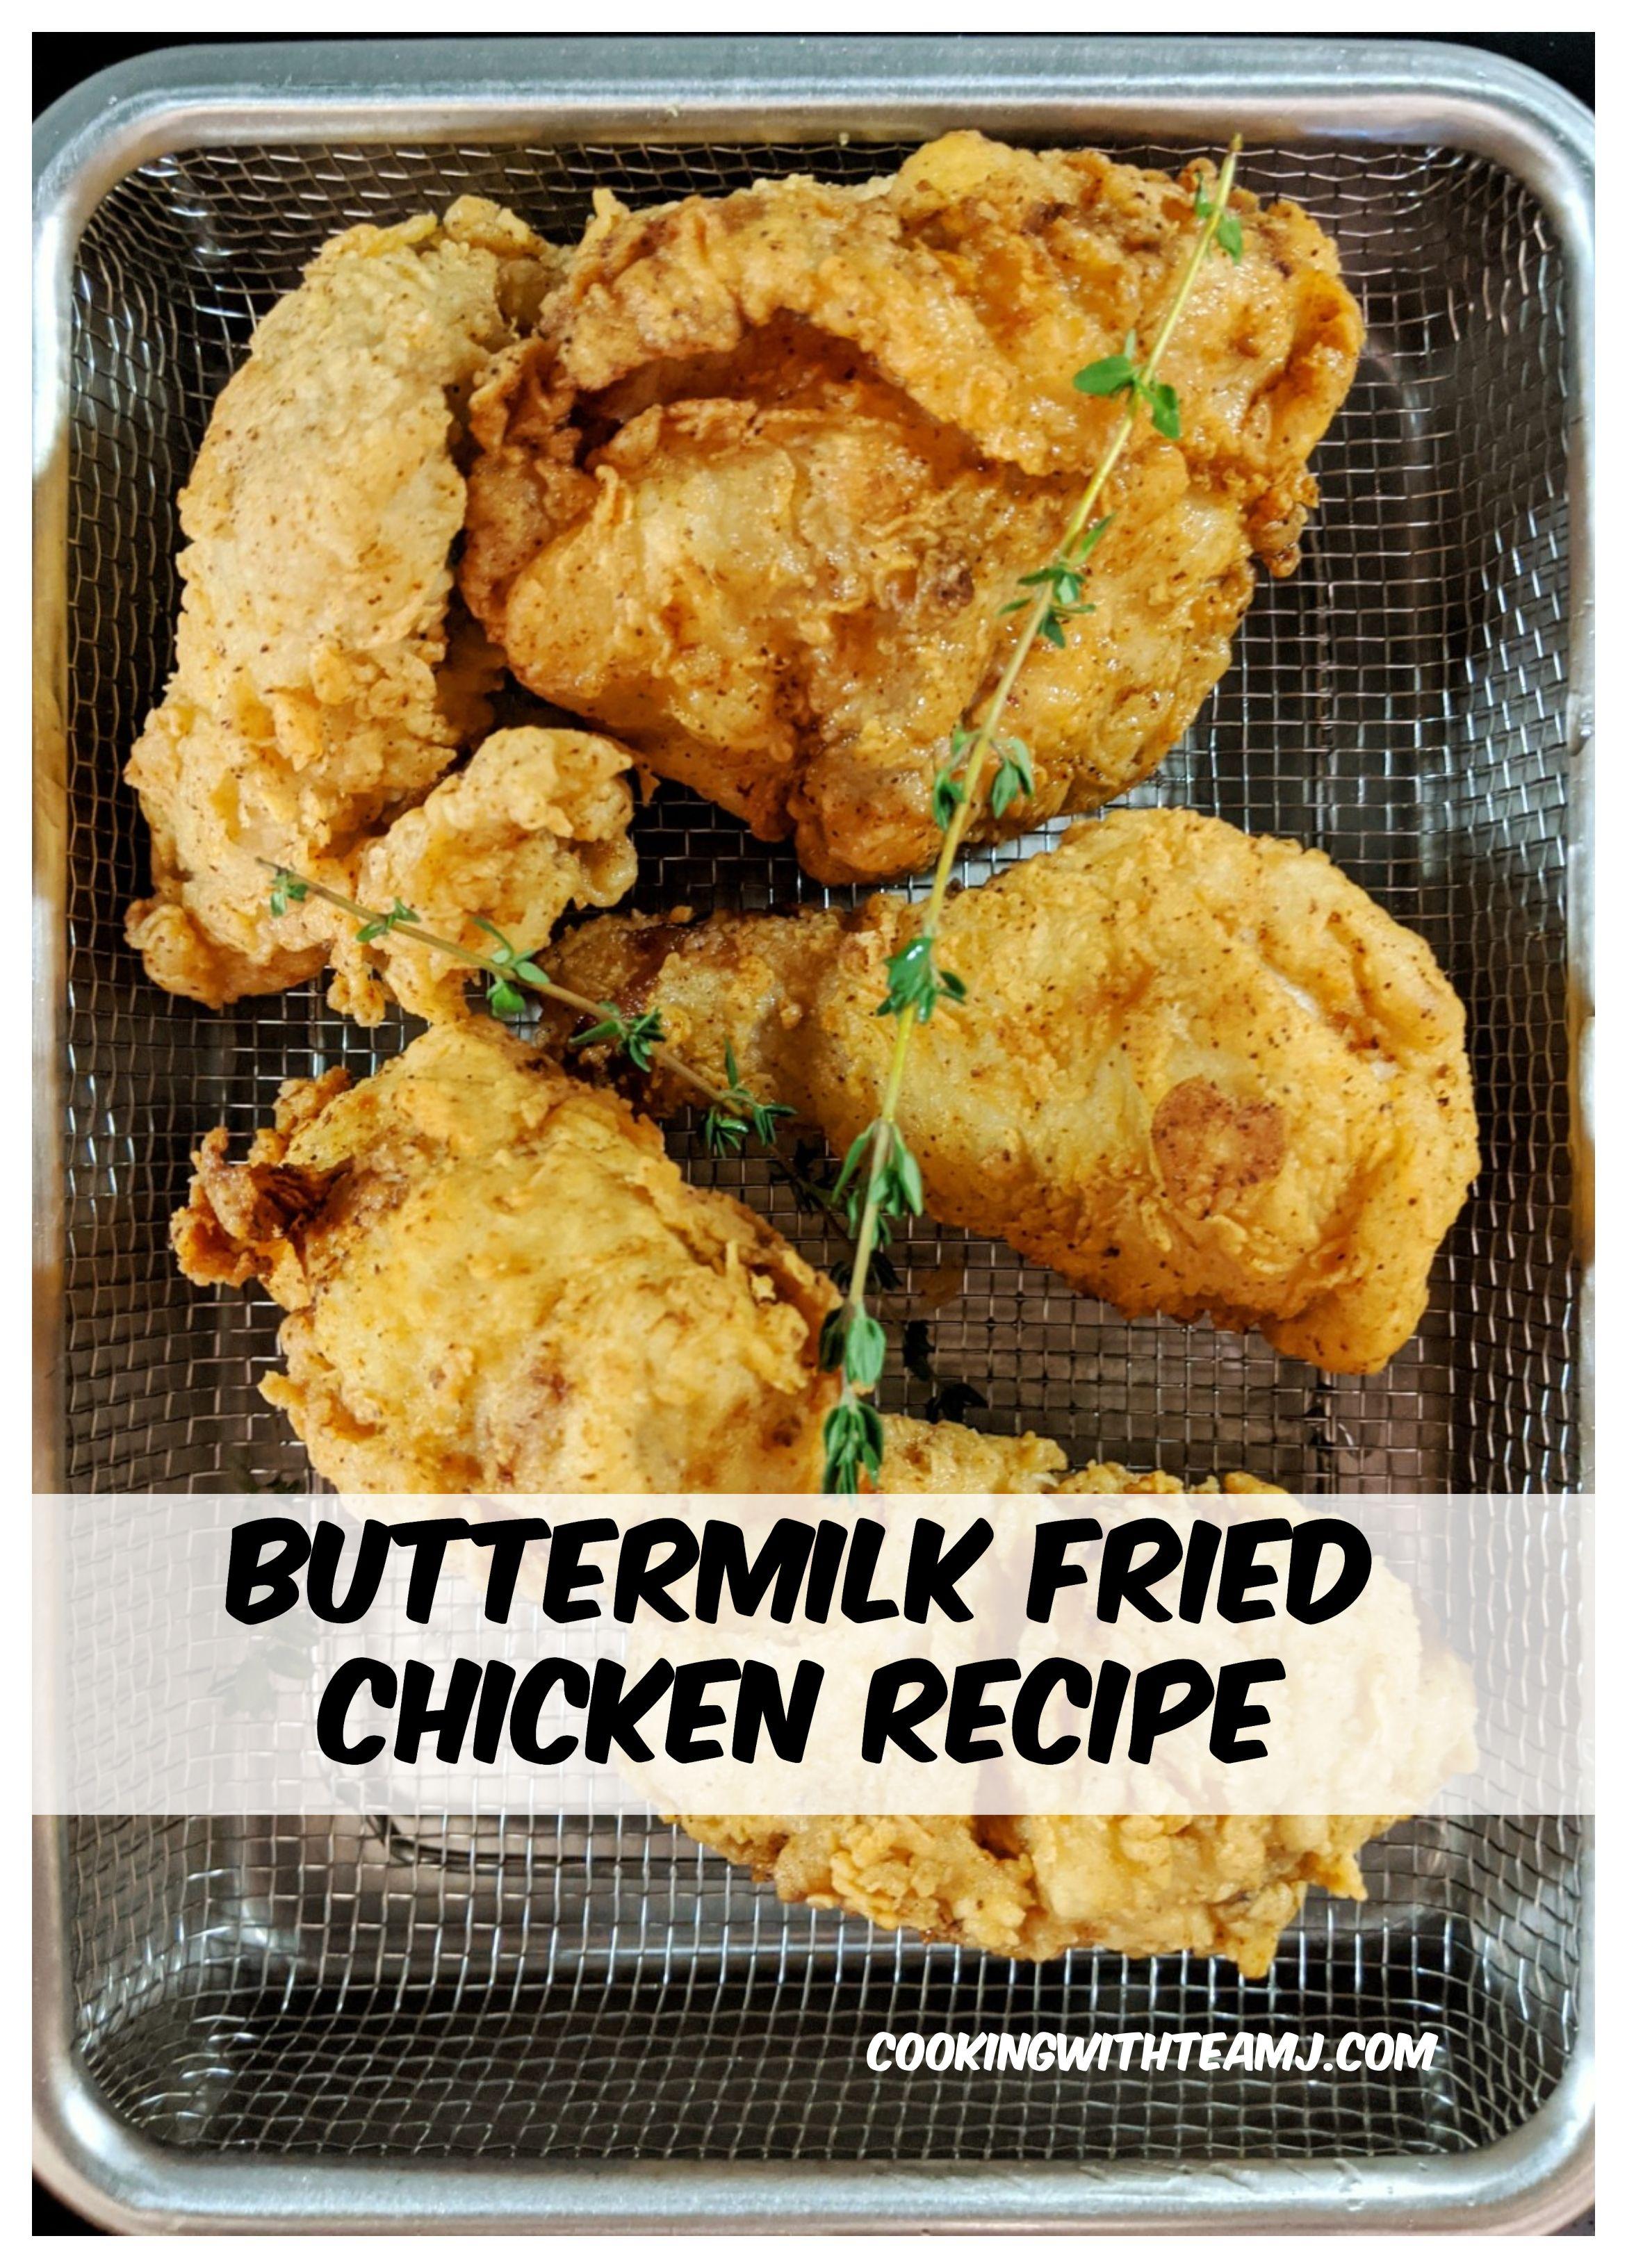 Buttermilk Fried Chicken Recipe Recipe In 2020 Chicken Recipes Fried Chicken Recipes